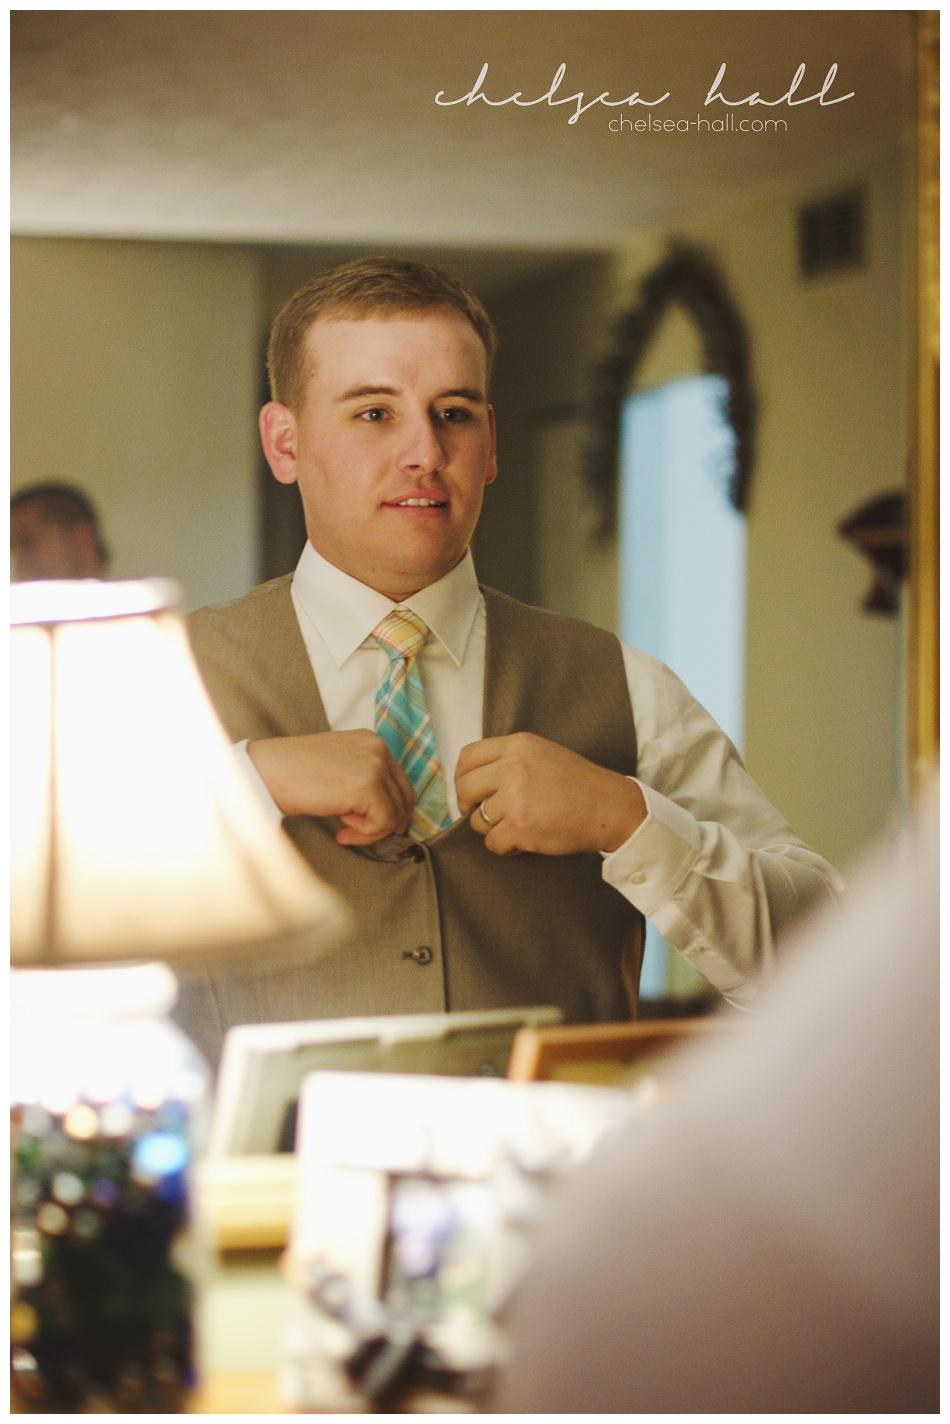 Chelsea Hall Photography, Dayton Wedding Photography, Kettering Wedding Photographer_0006